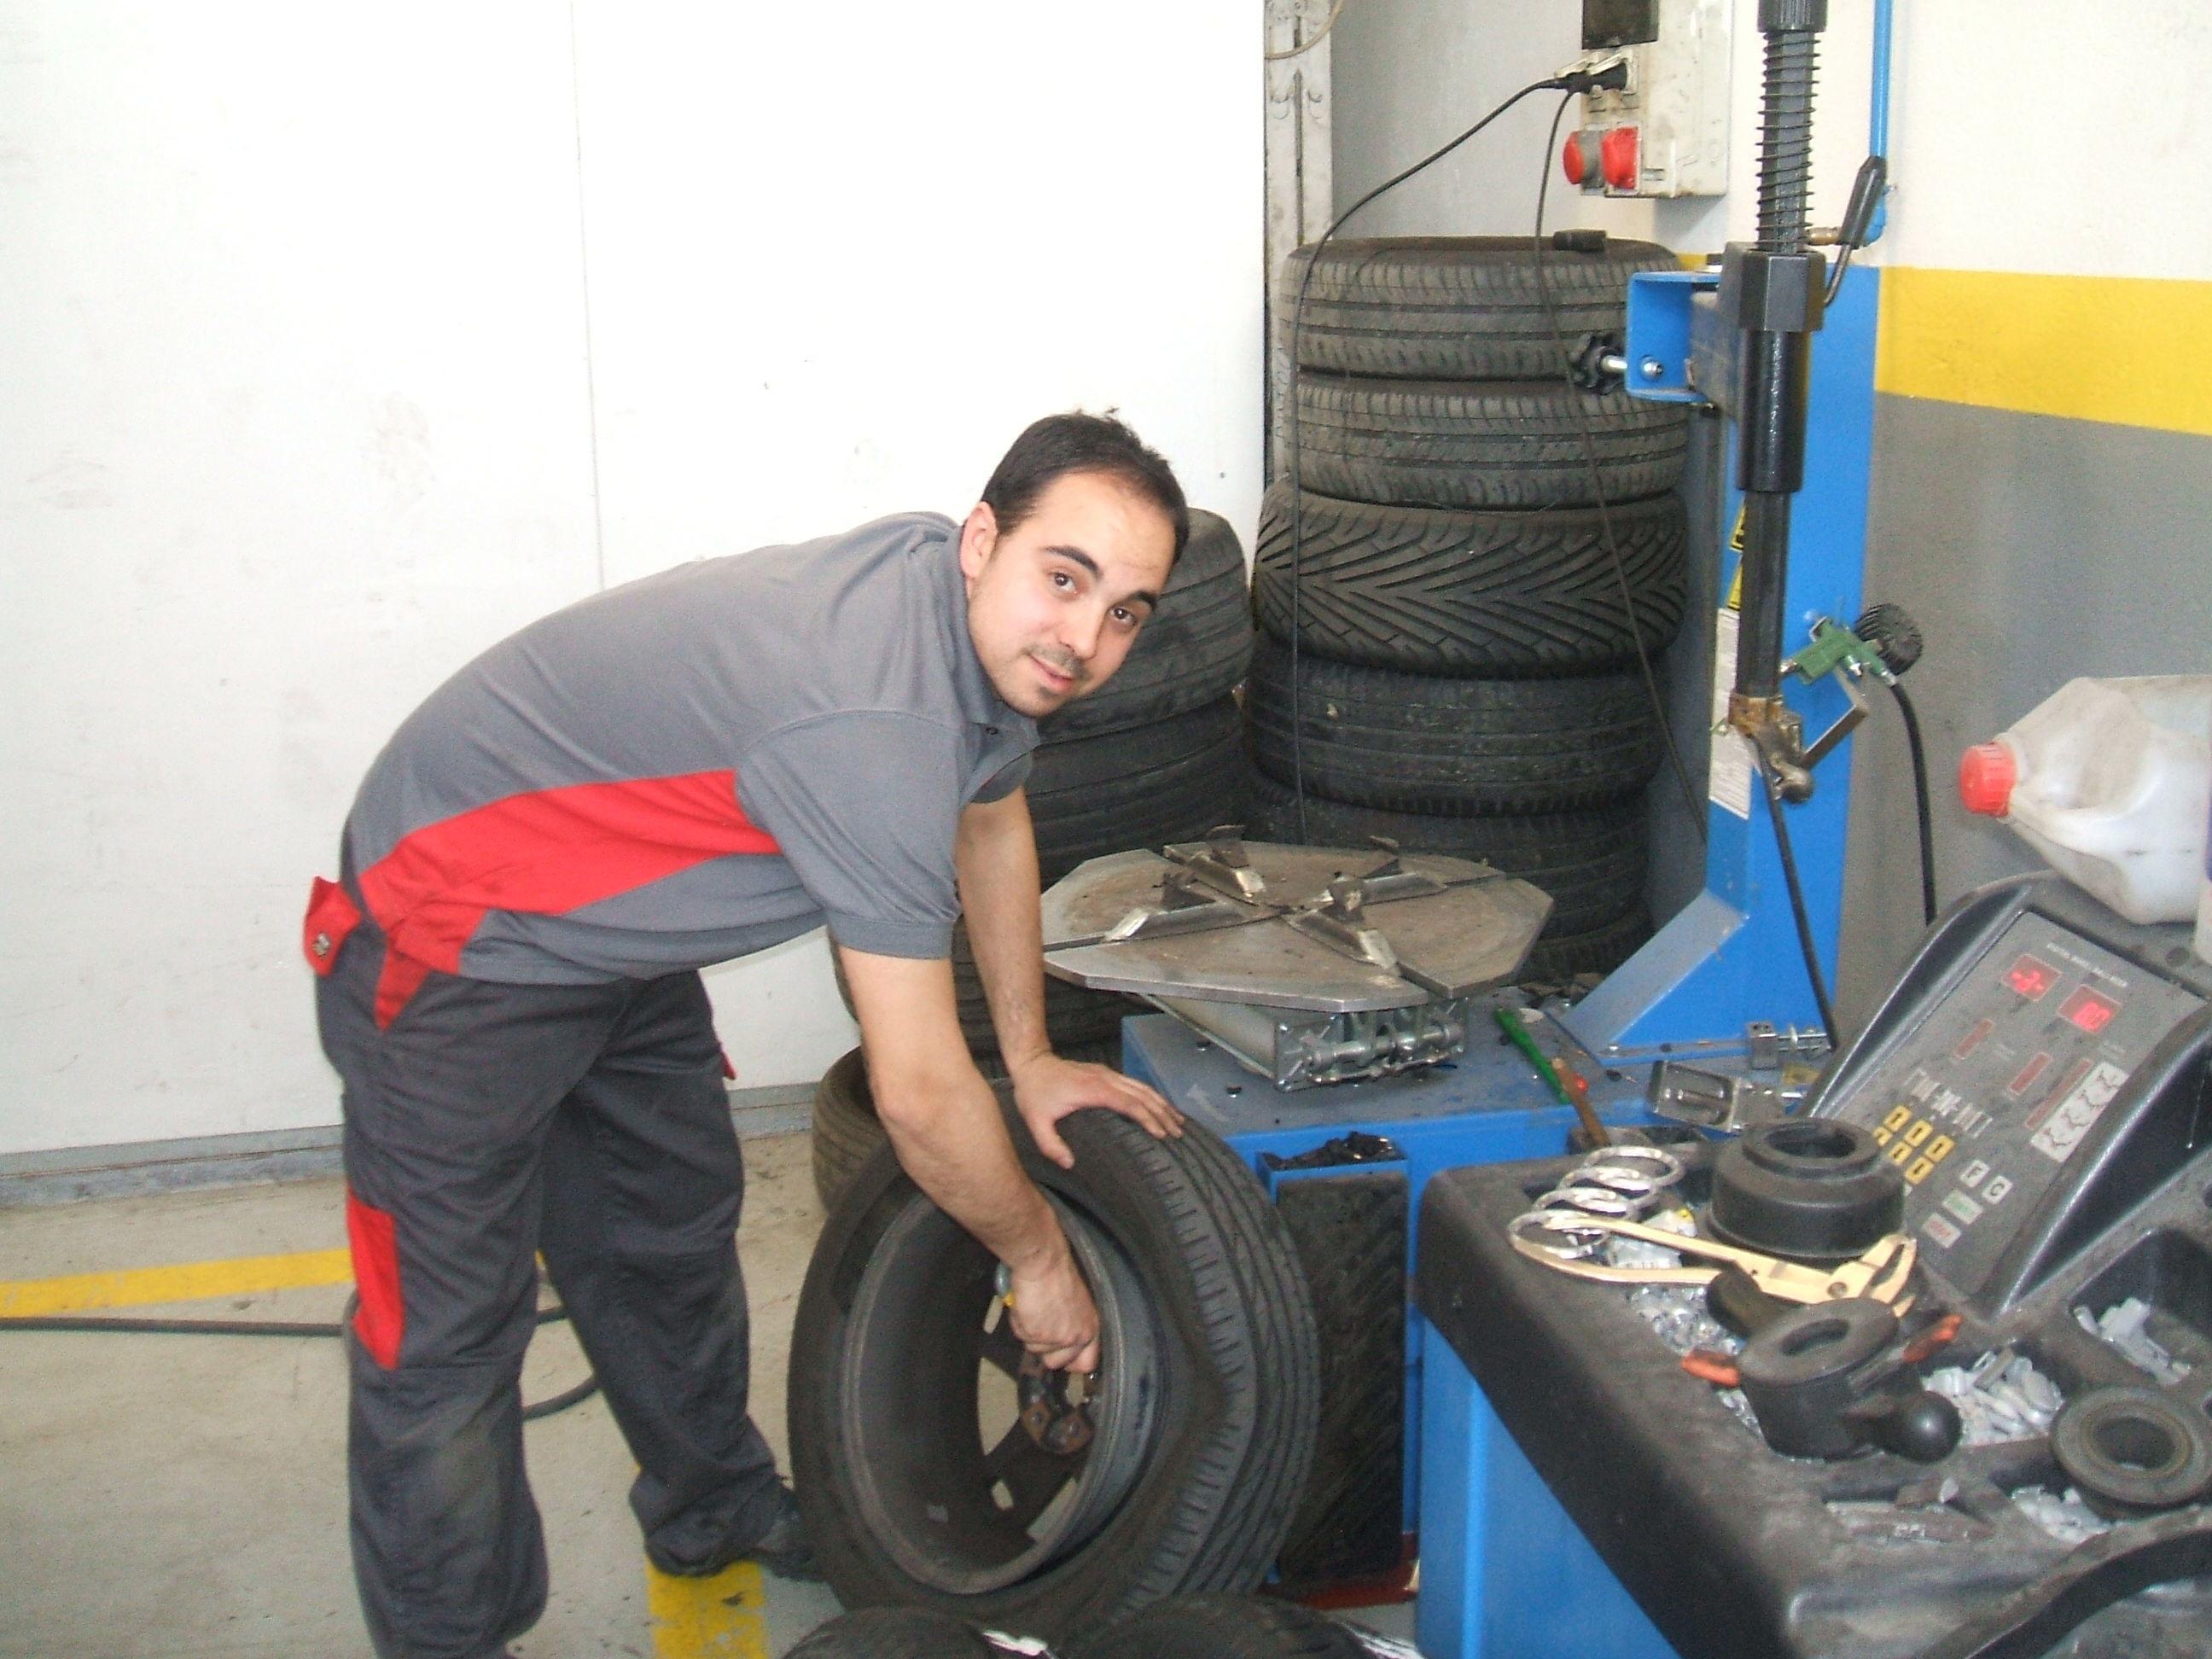 Foto 2 de Talleres de automóviles en Pinto | Pintocar